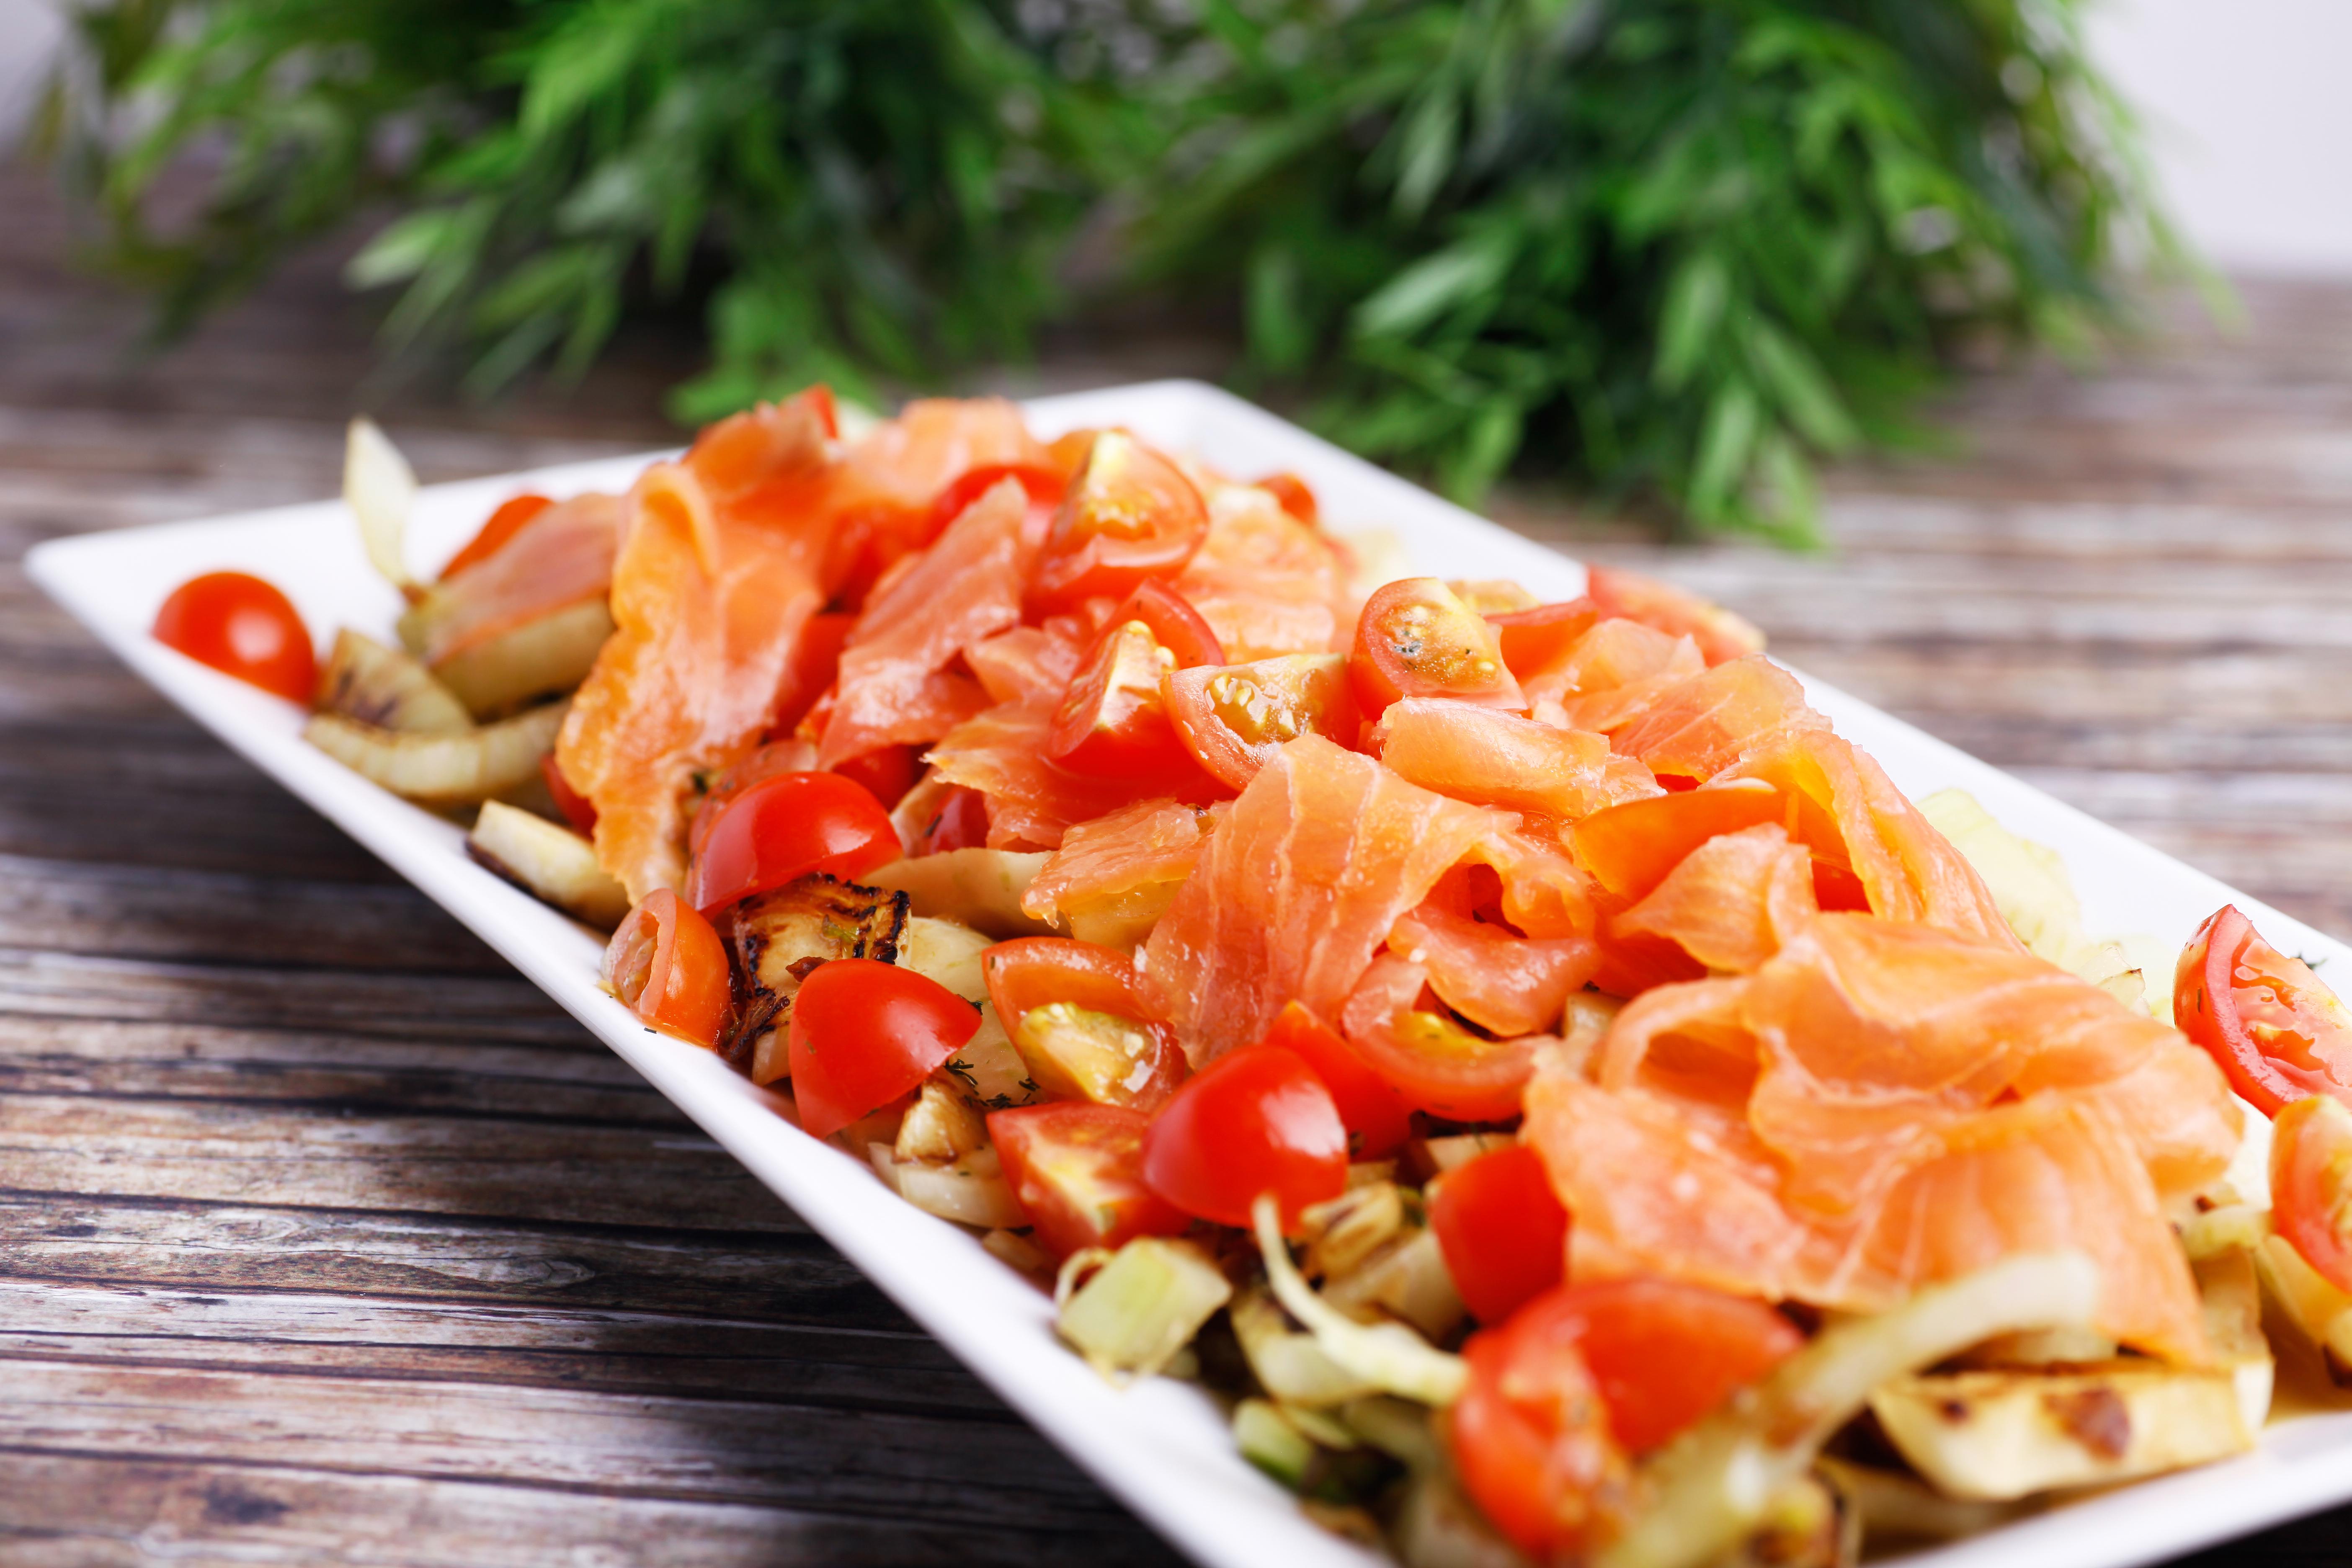 Essen Ohne Kohlenhydrate Abnehmen Mit Low Carb Bodychange